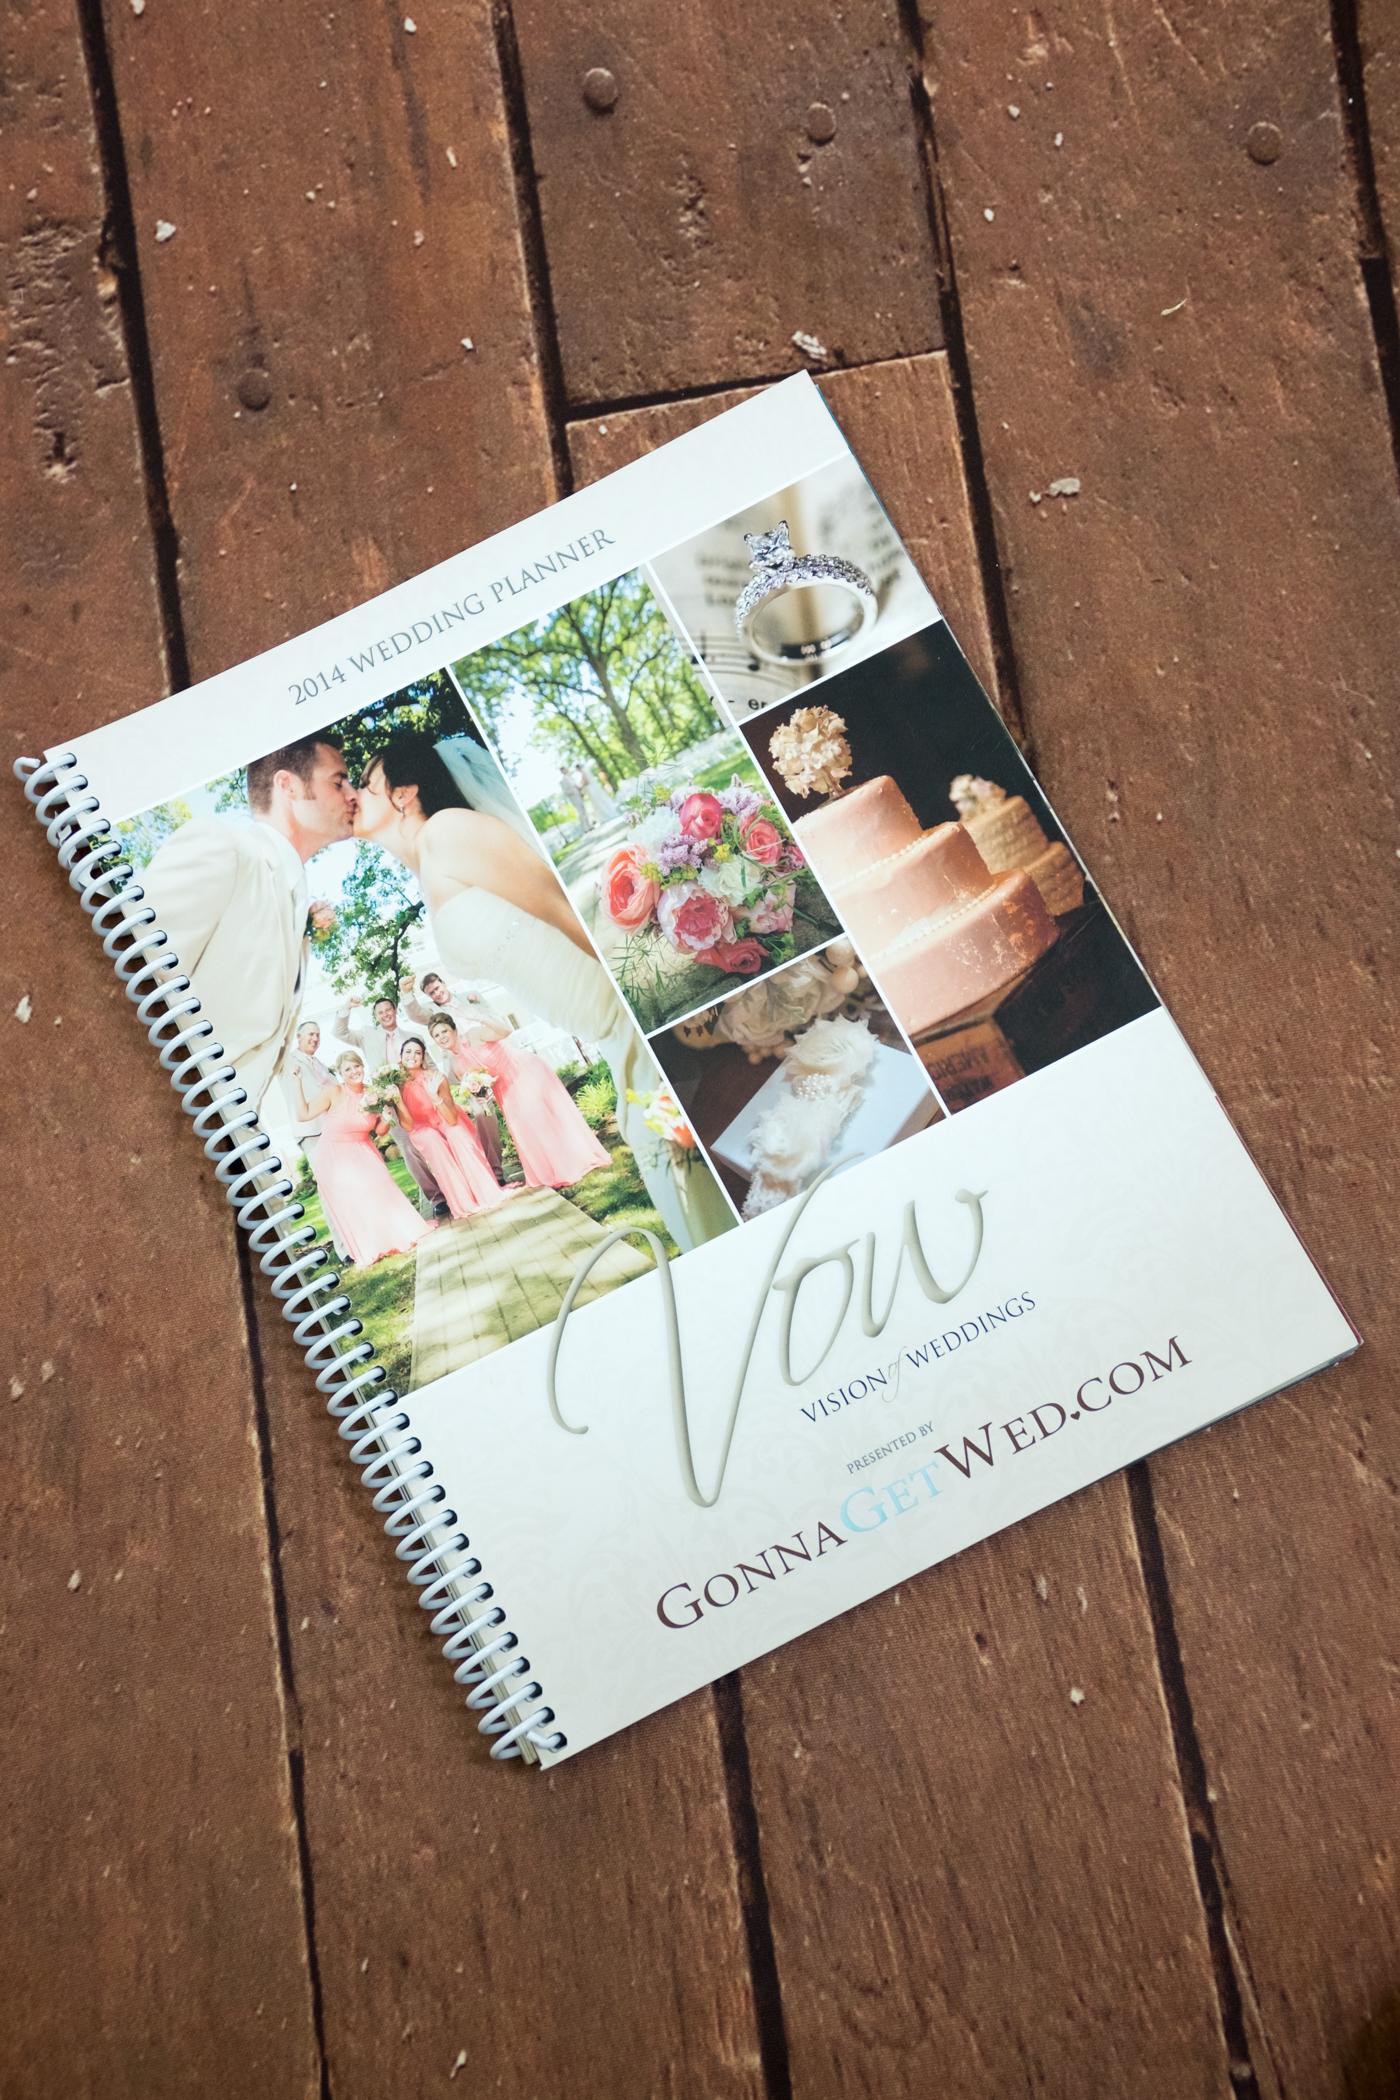 The Vow Wedding Magazine